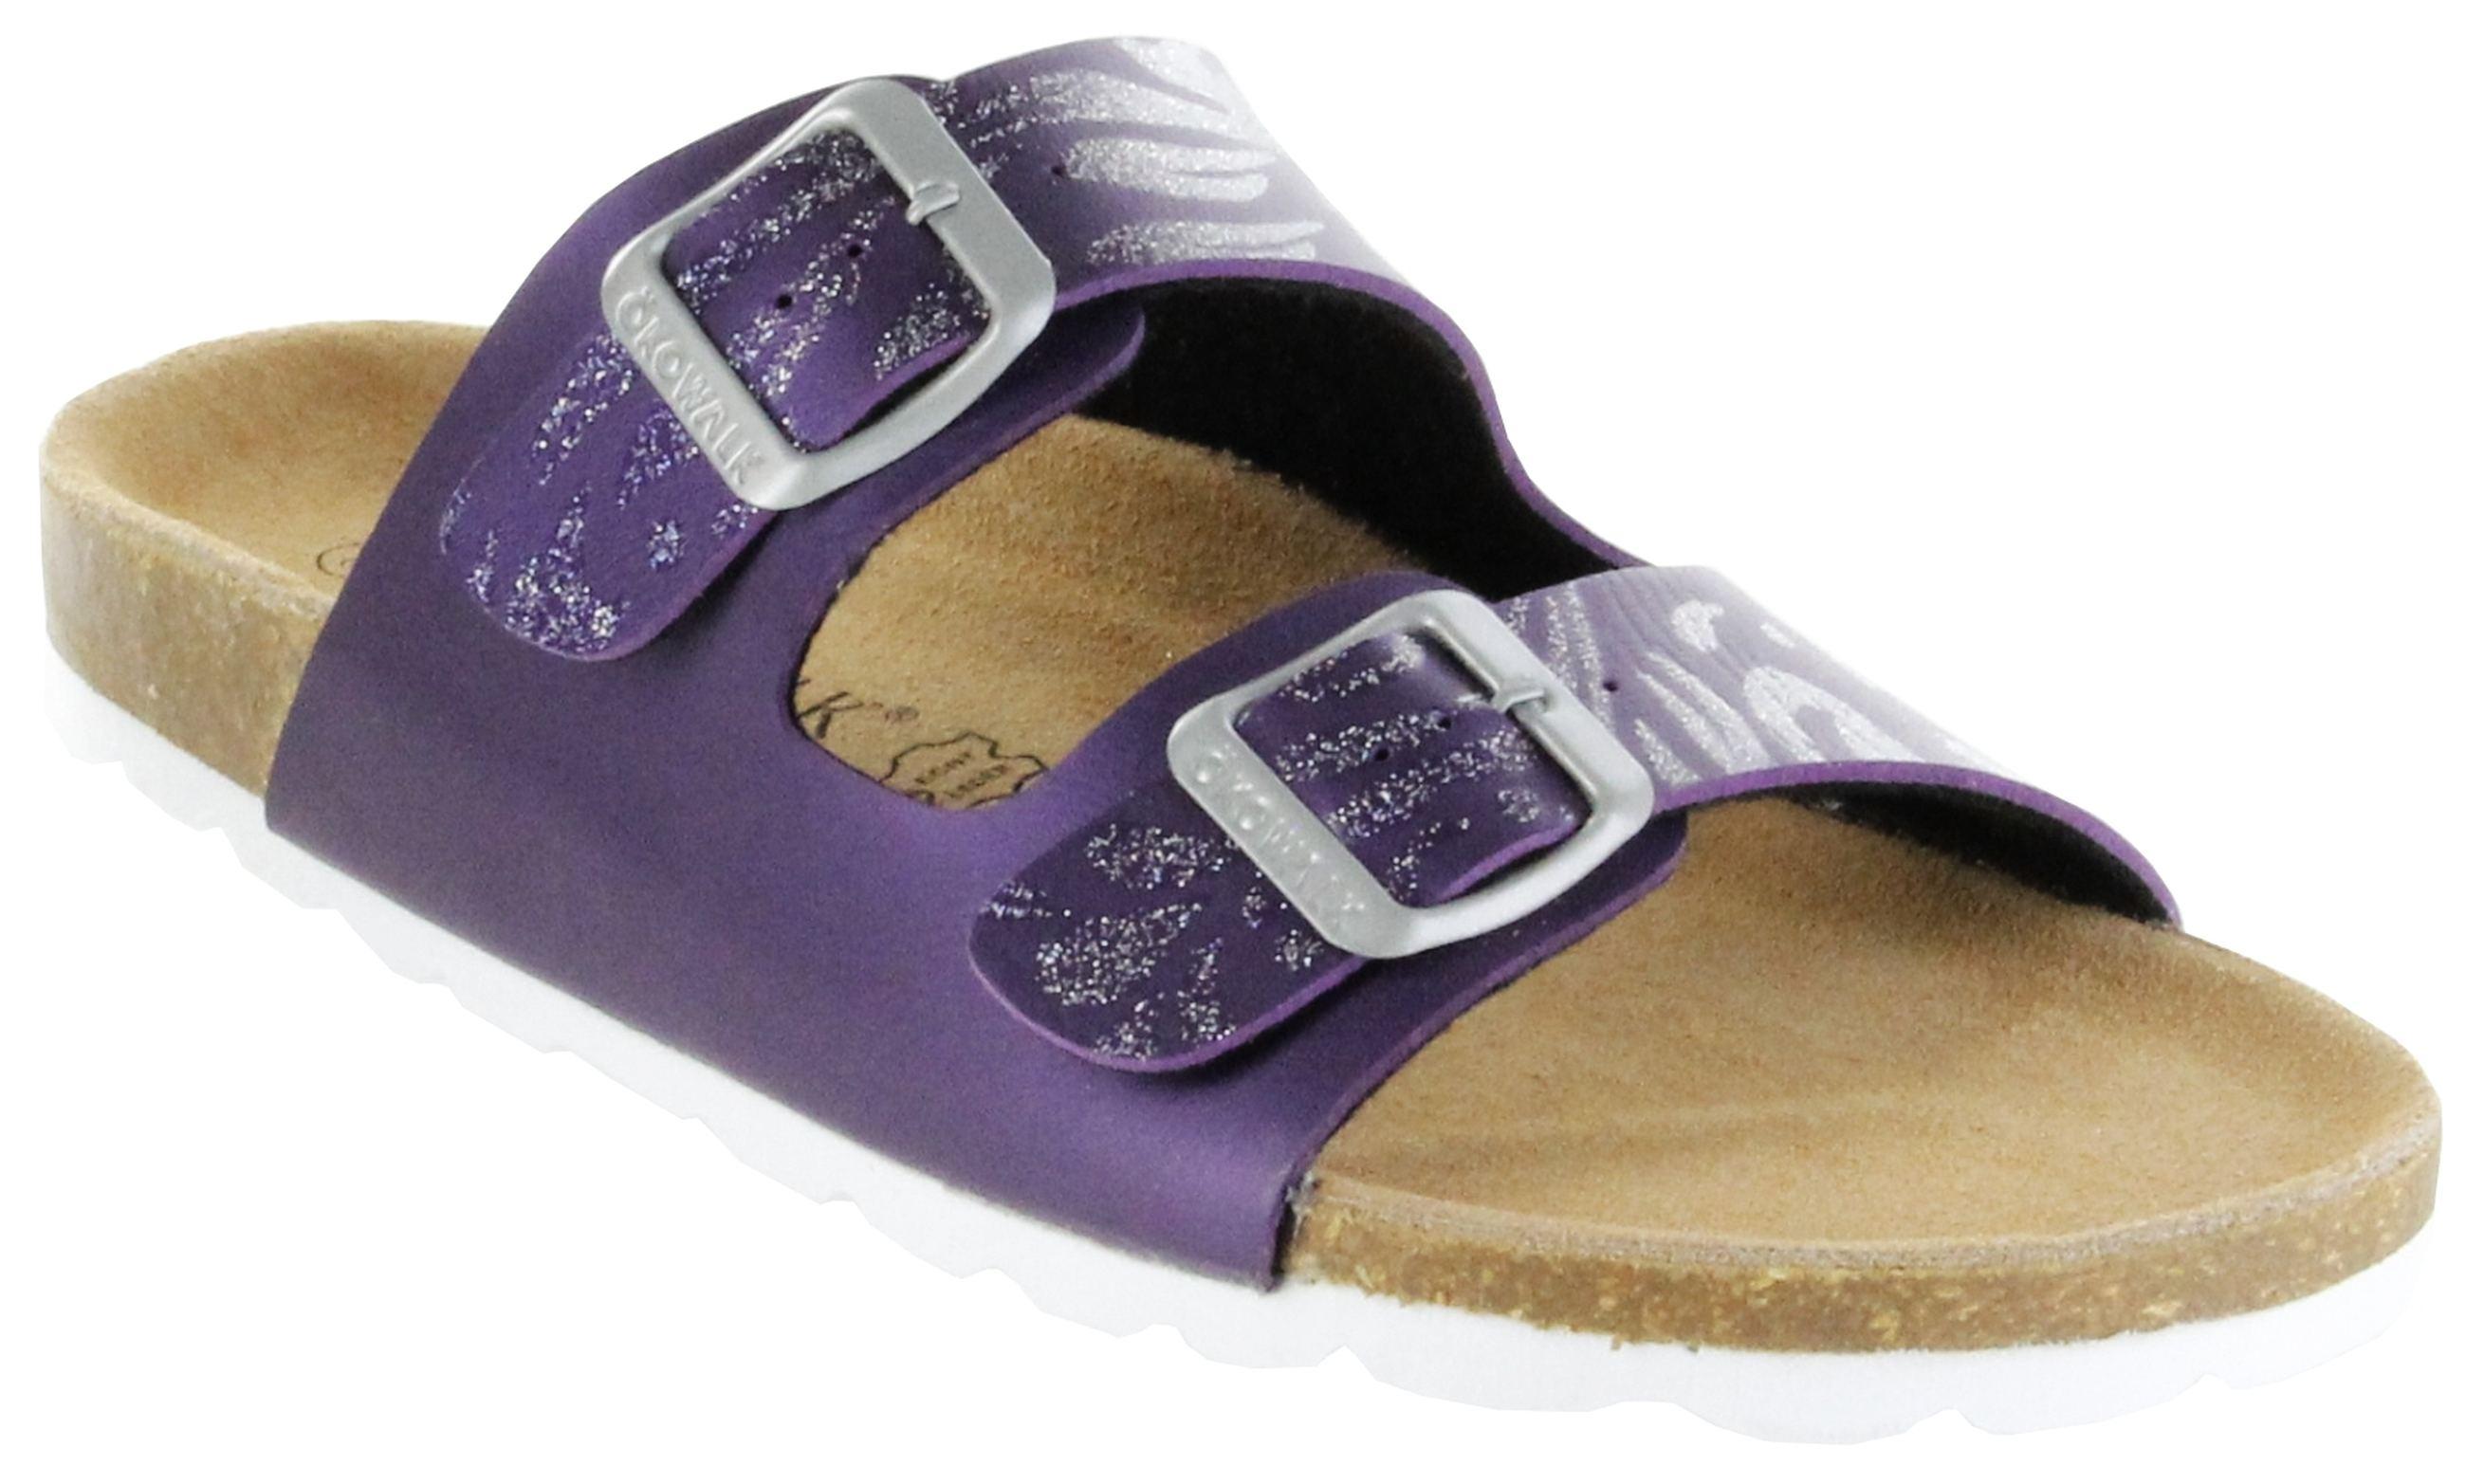 7284ef58fc76 ÖkoWalk Bios Sandalen Hausschuhe Lederdeck purple leicht non-marking Sohle Damen  Schuhe Victoria